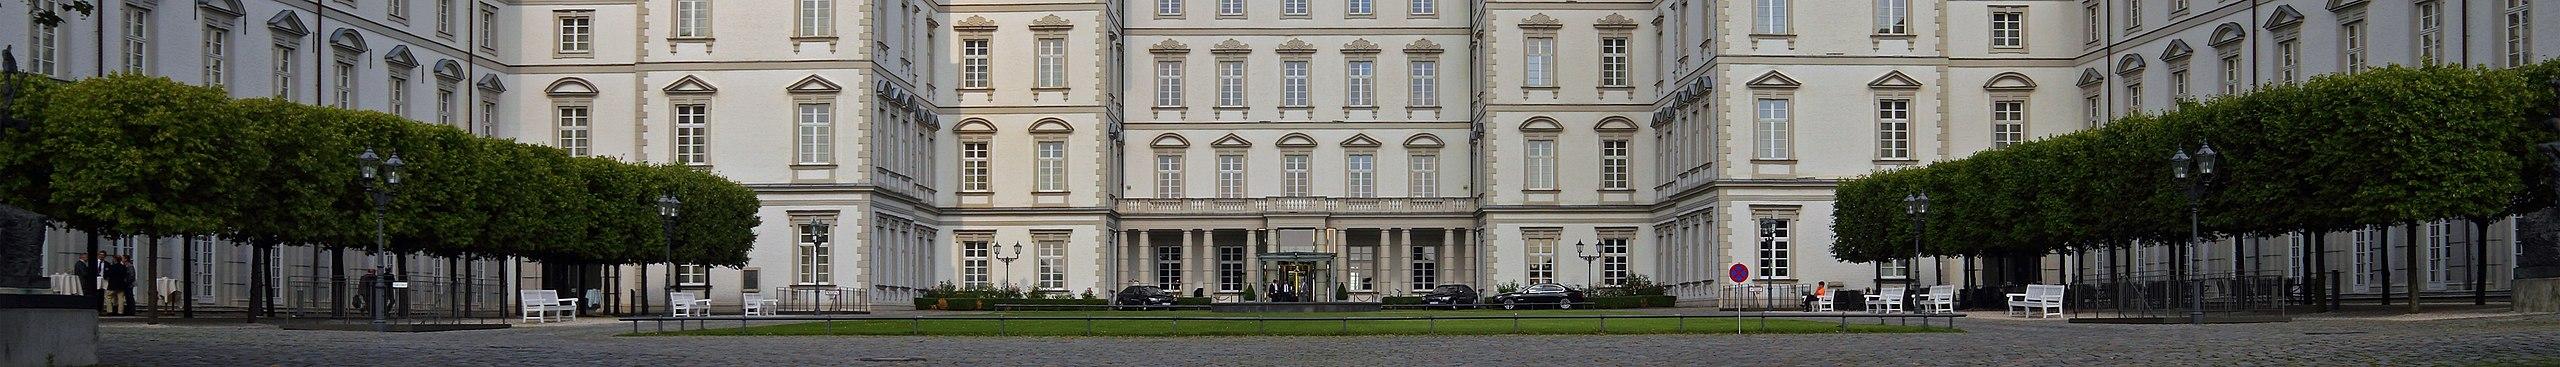 Hotel Bergisches Land Wellneb